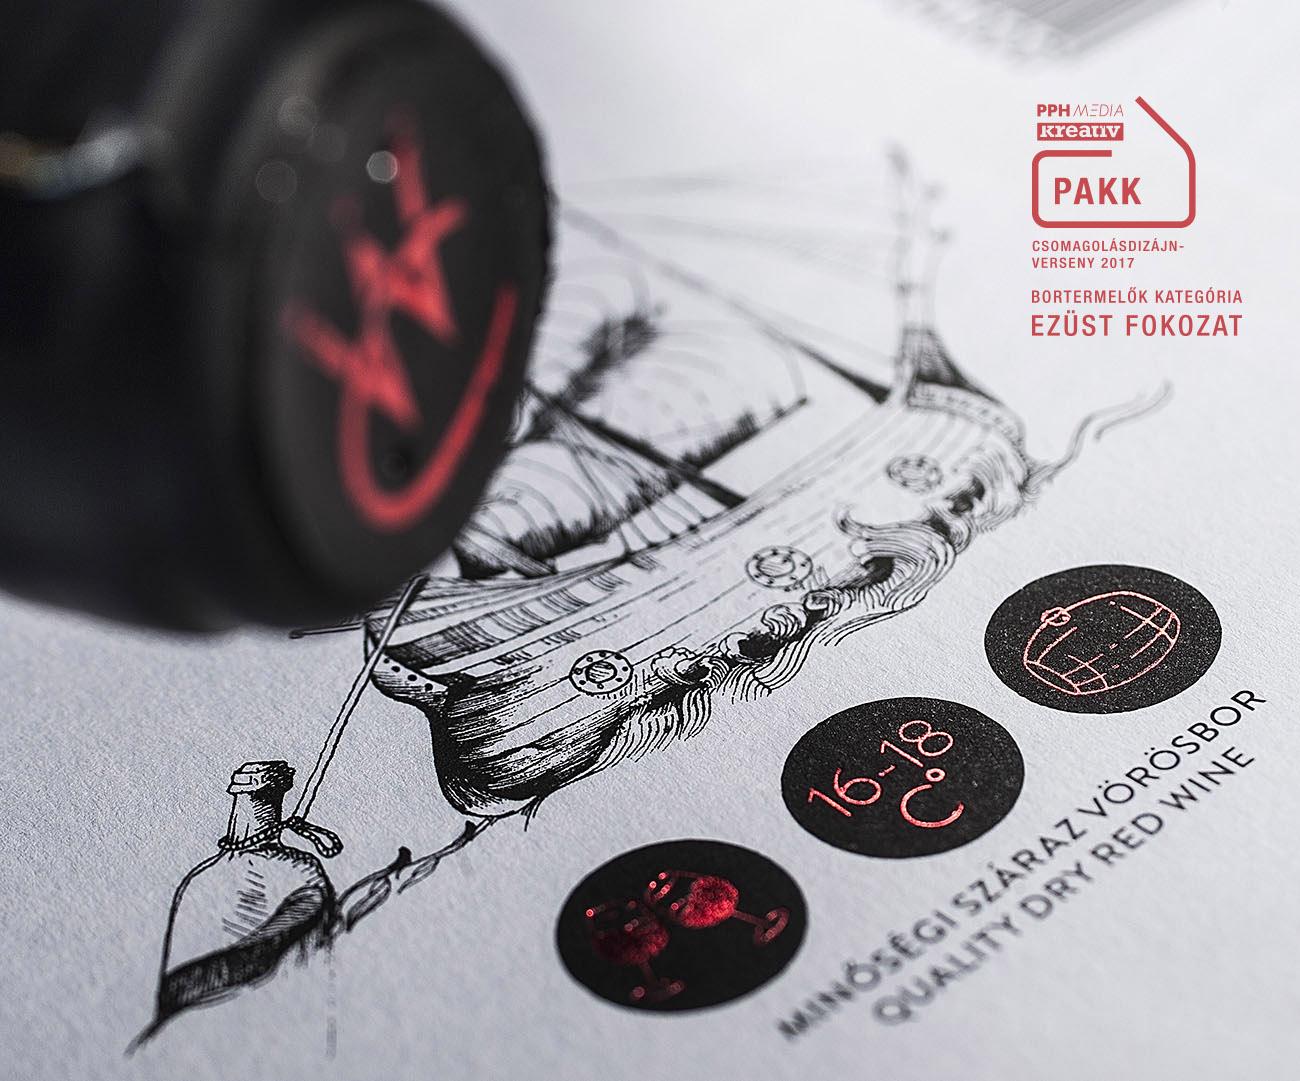 Creatura Wine borászat arculat logója